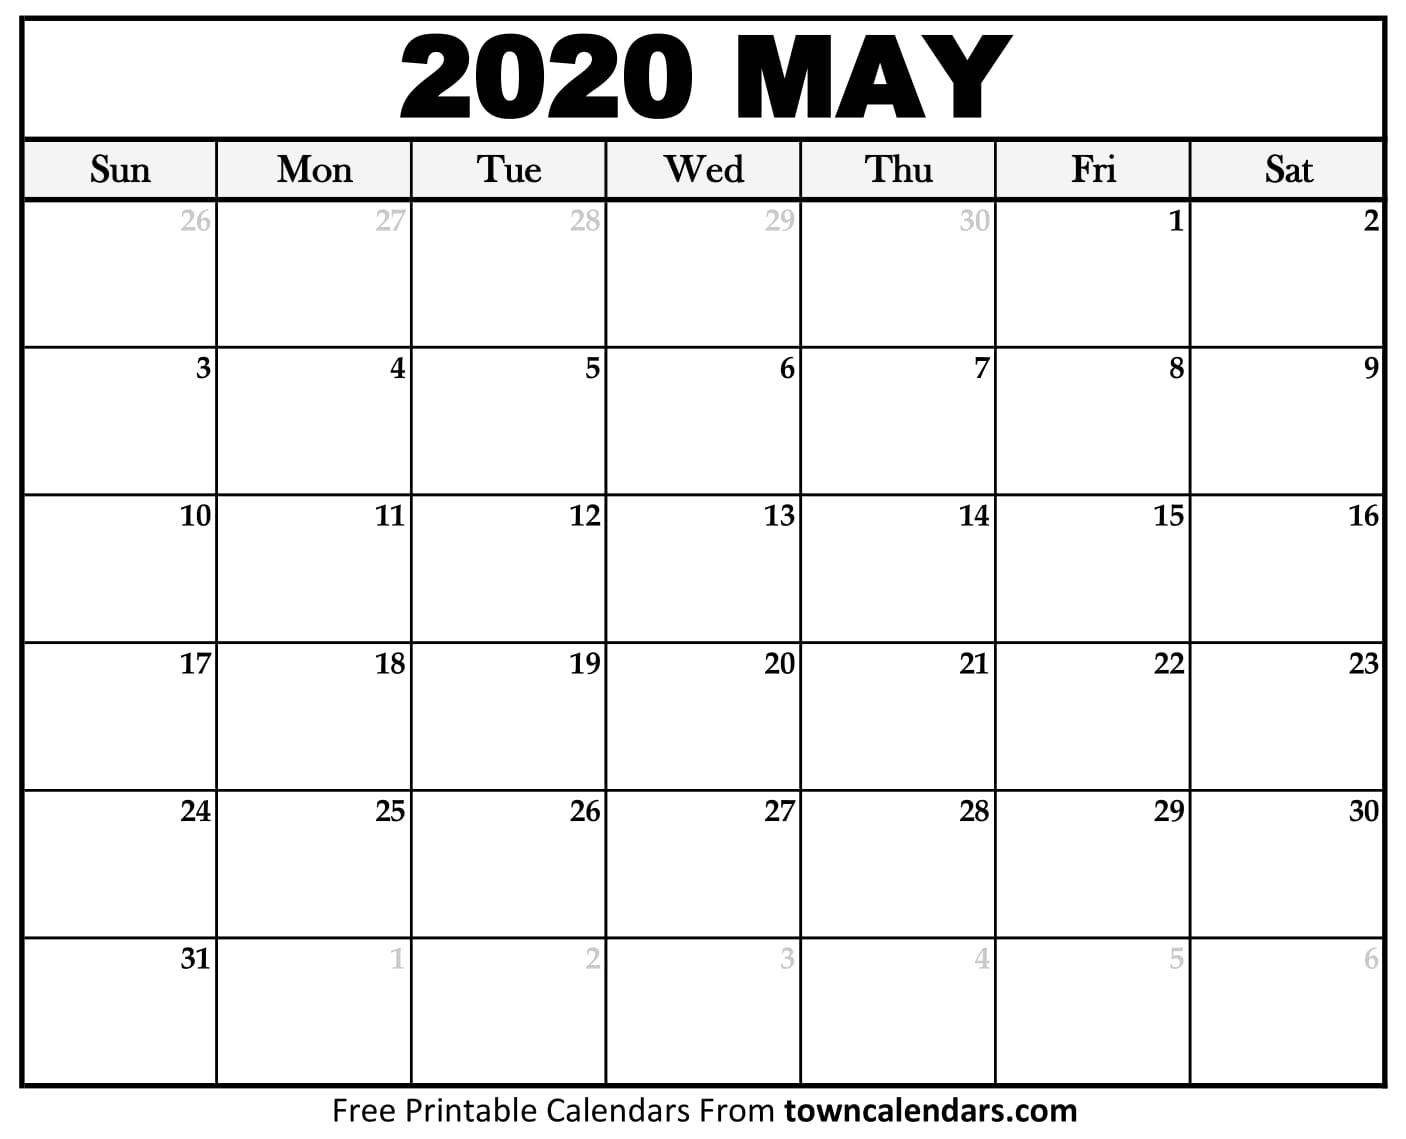 Printable May 2020 Calendar - Towncalendars